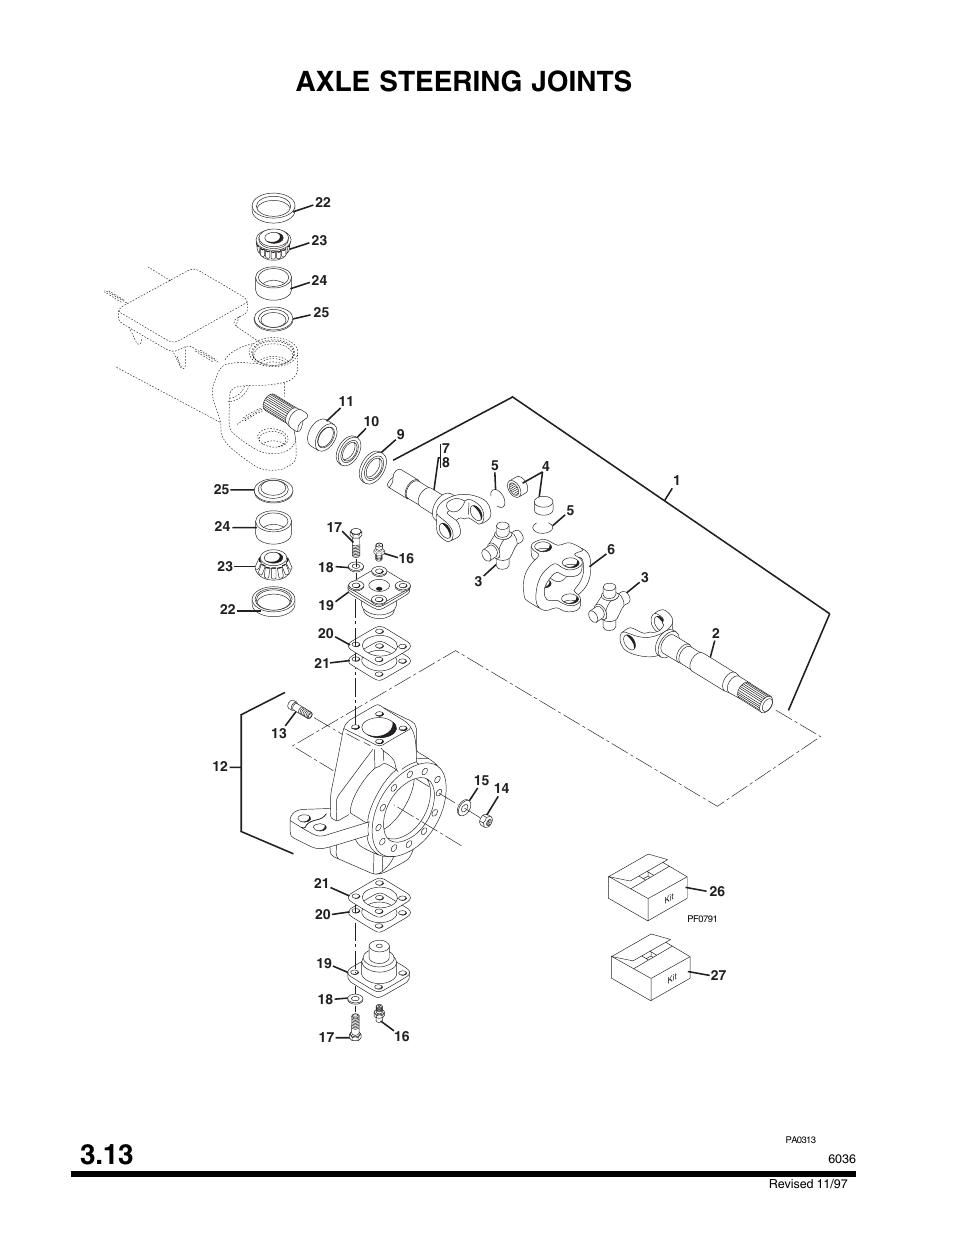 Axle Steering Joints 3 13